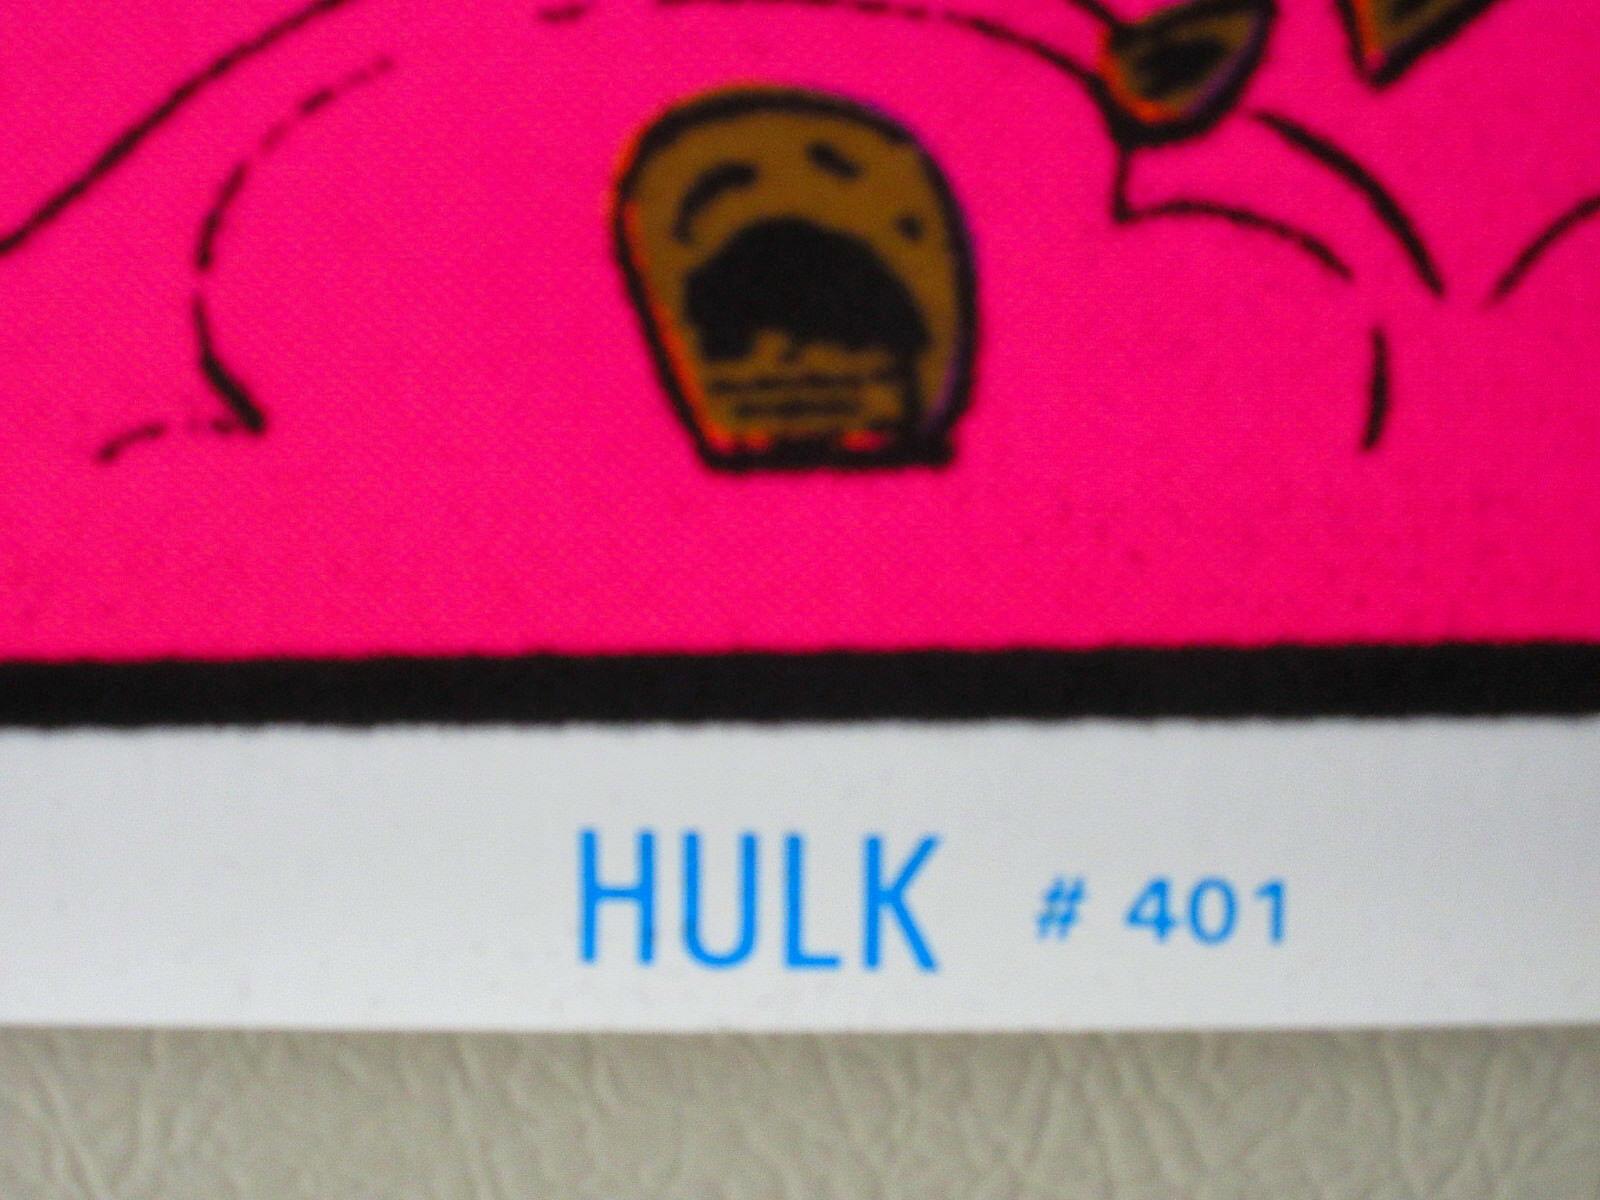 1996 Hulk 35 x 23 Marvel Comics blacklight poster 1: Avengers/1990's Marvelmania